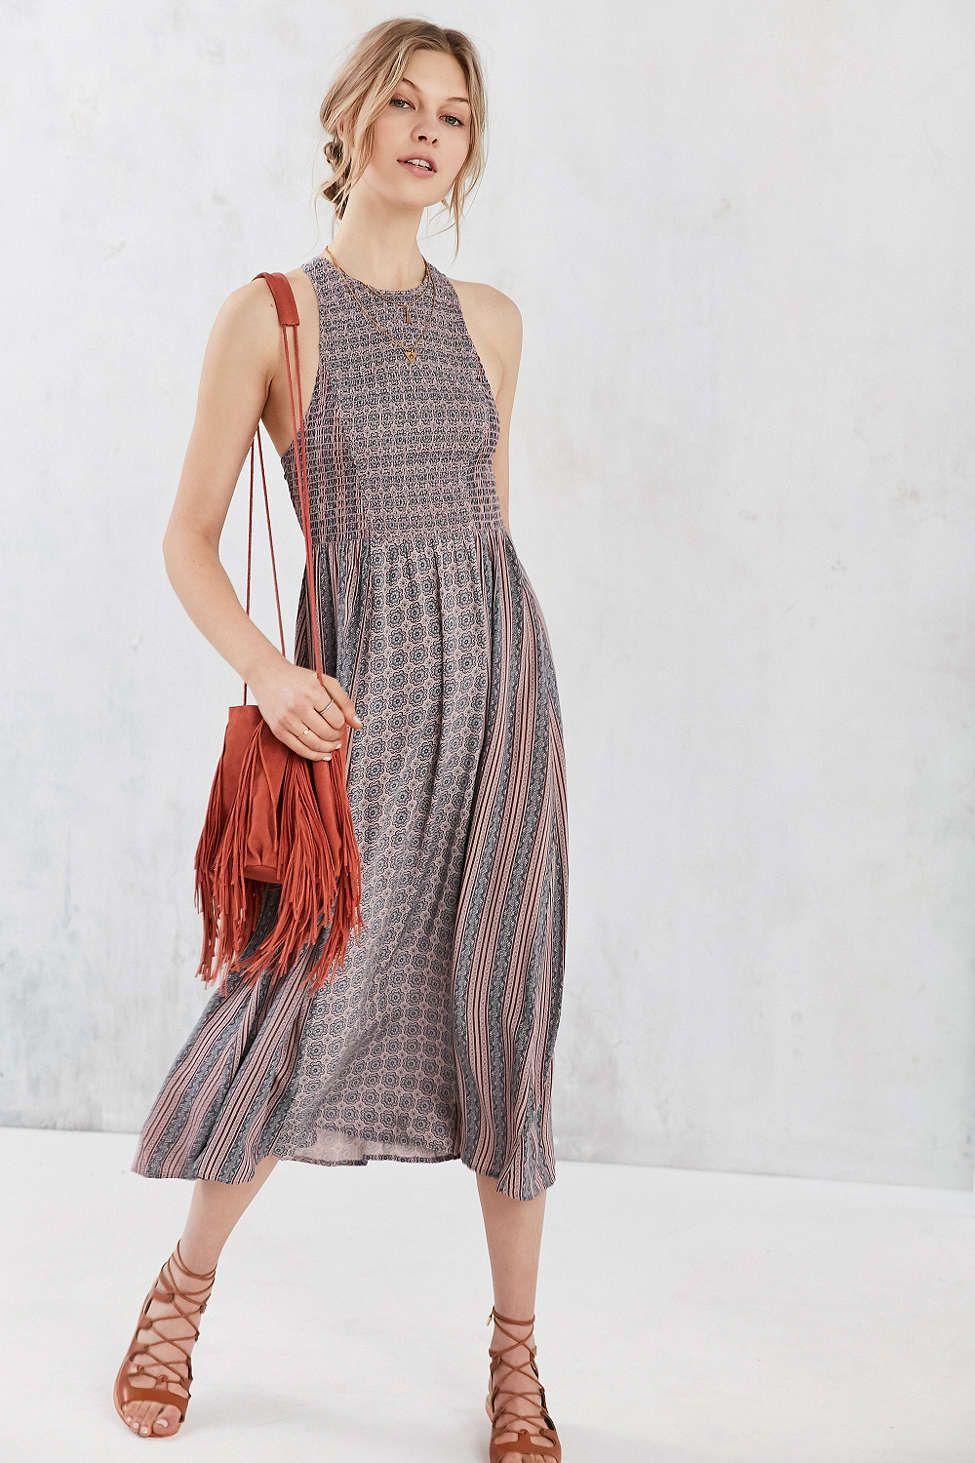 90af18c531fba Kimchi Blue Joclyn Smocked Bodice Midi Dress #UrbanOutfitters $70